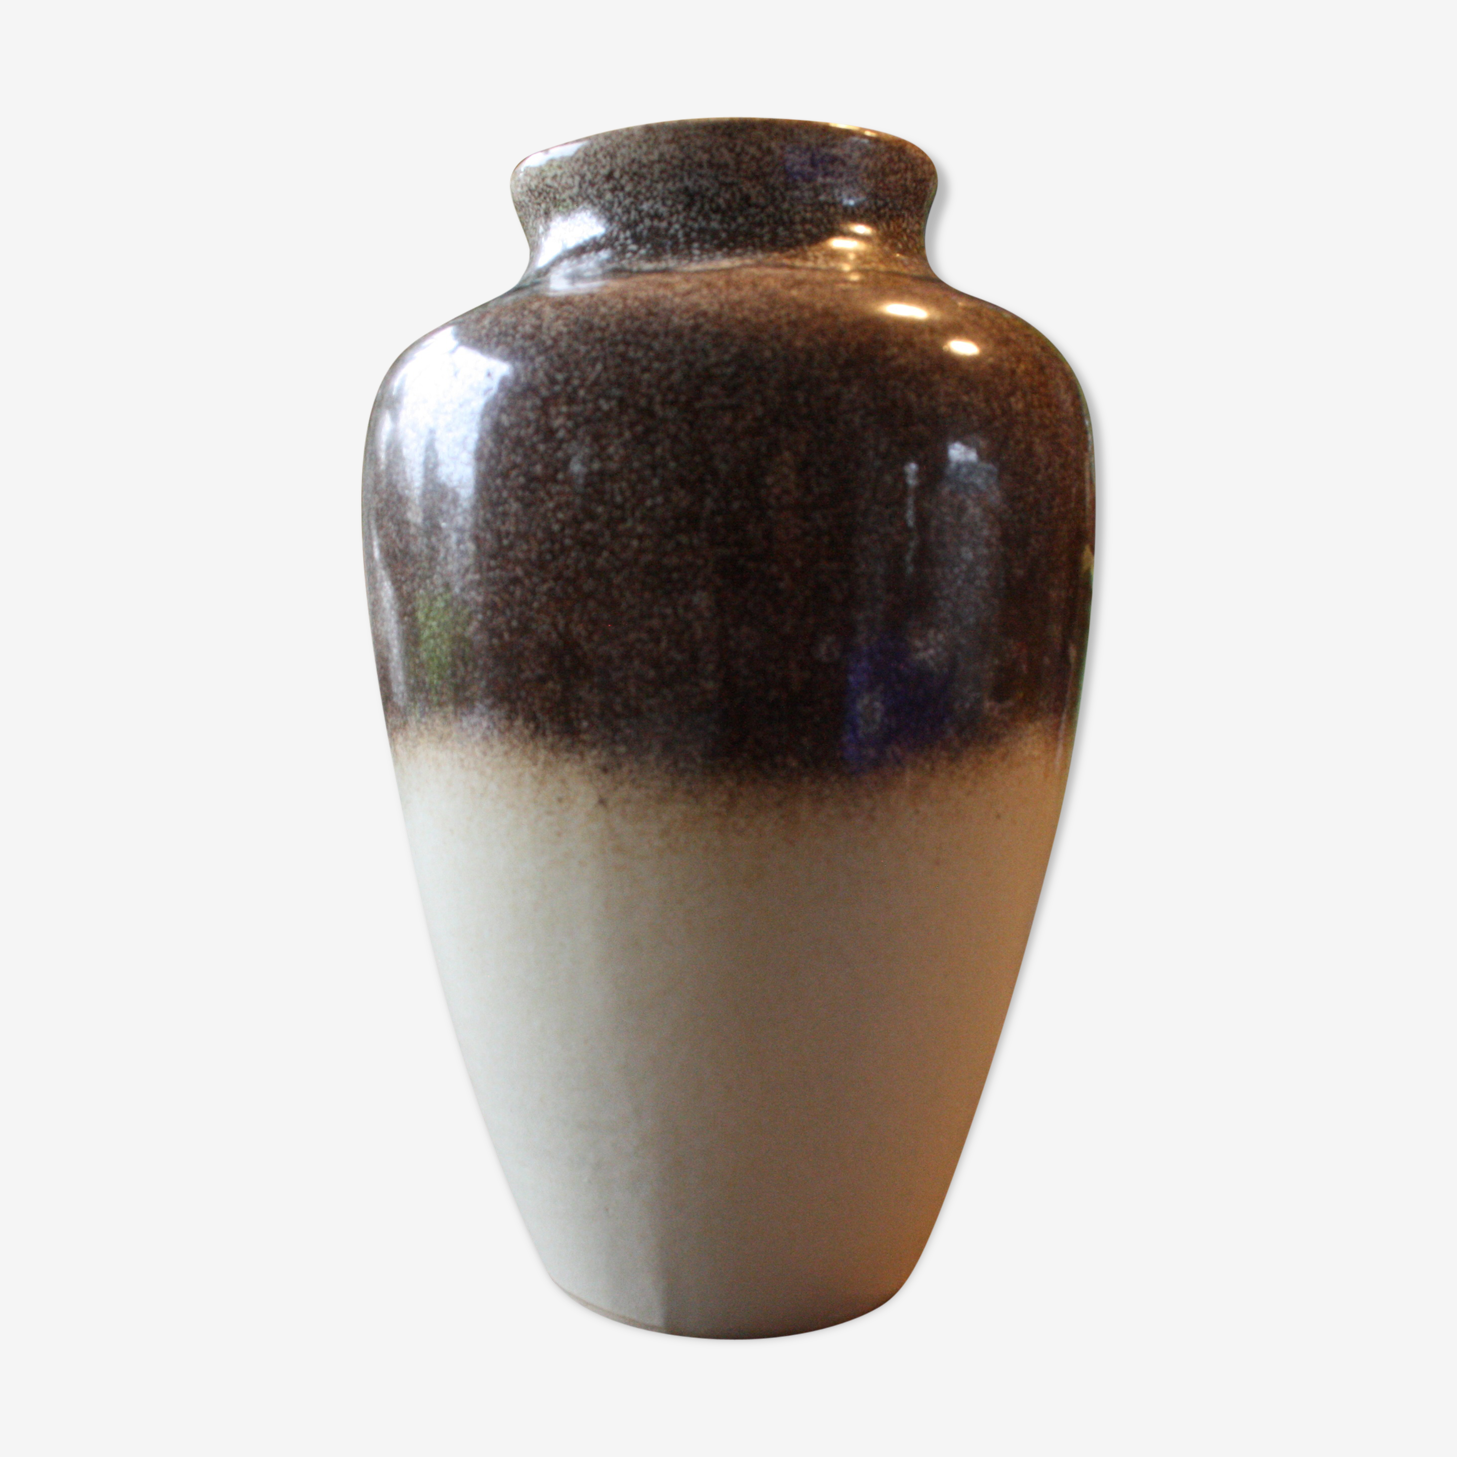 Vase Germany beige